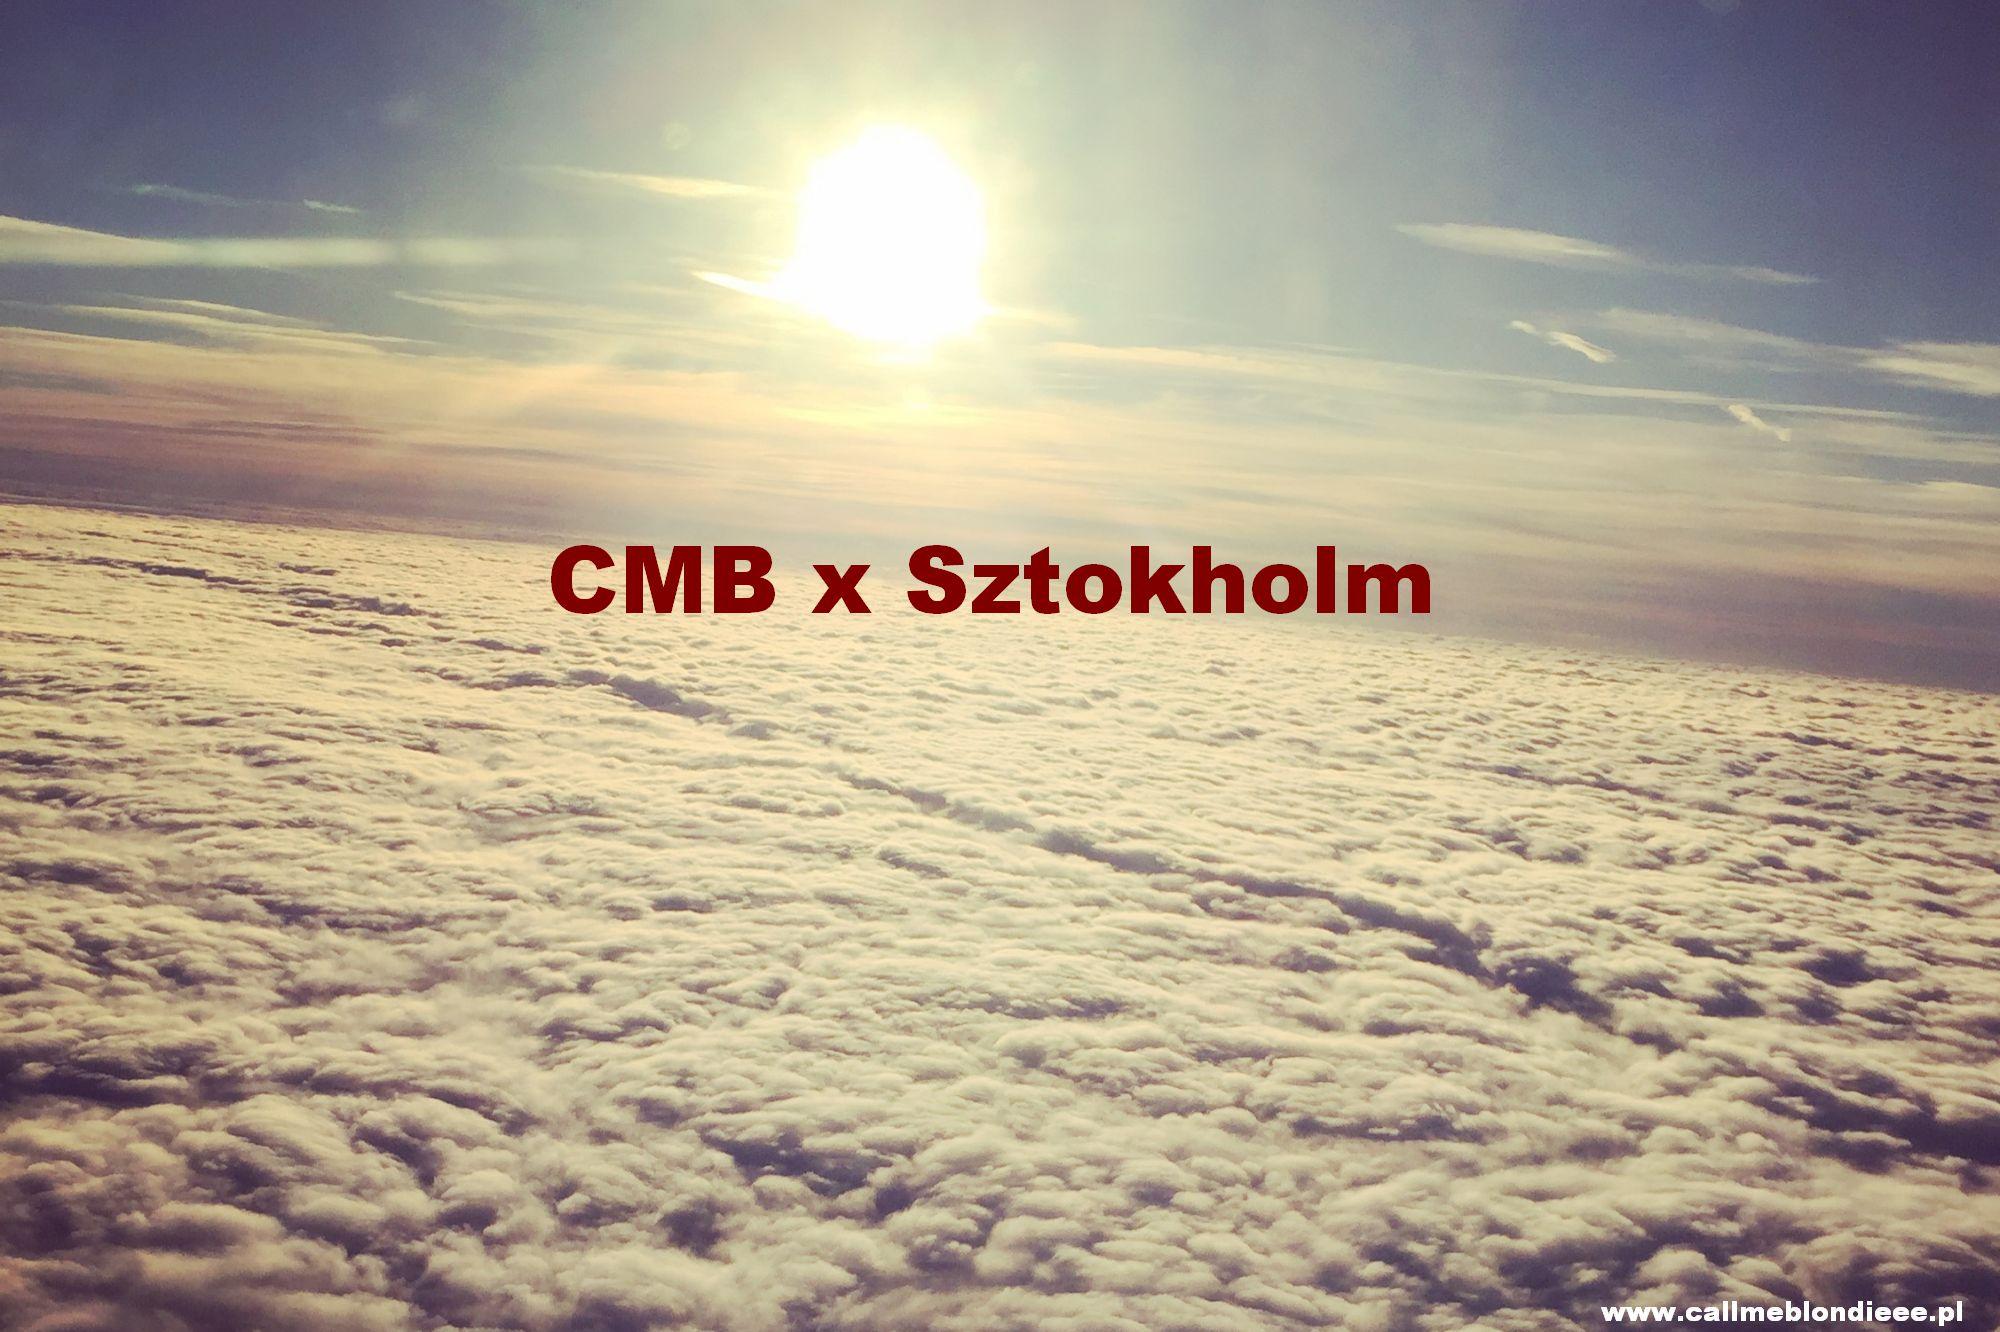 CMB x Sztokholm